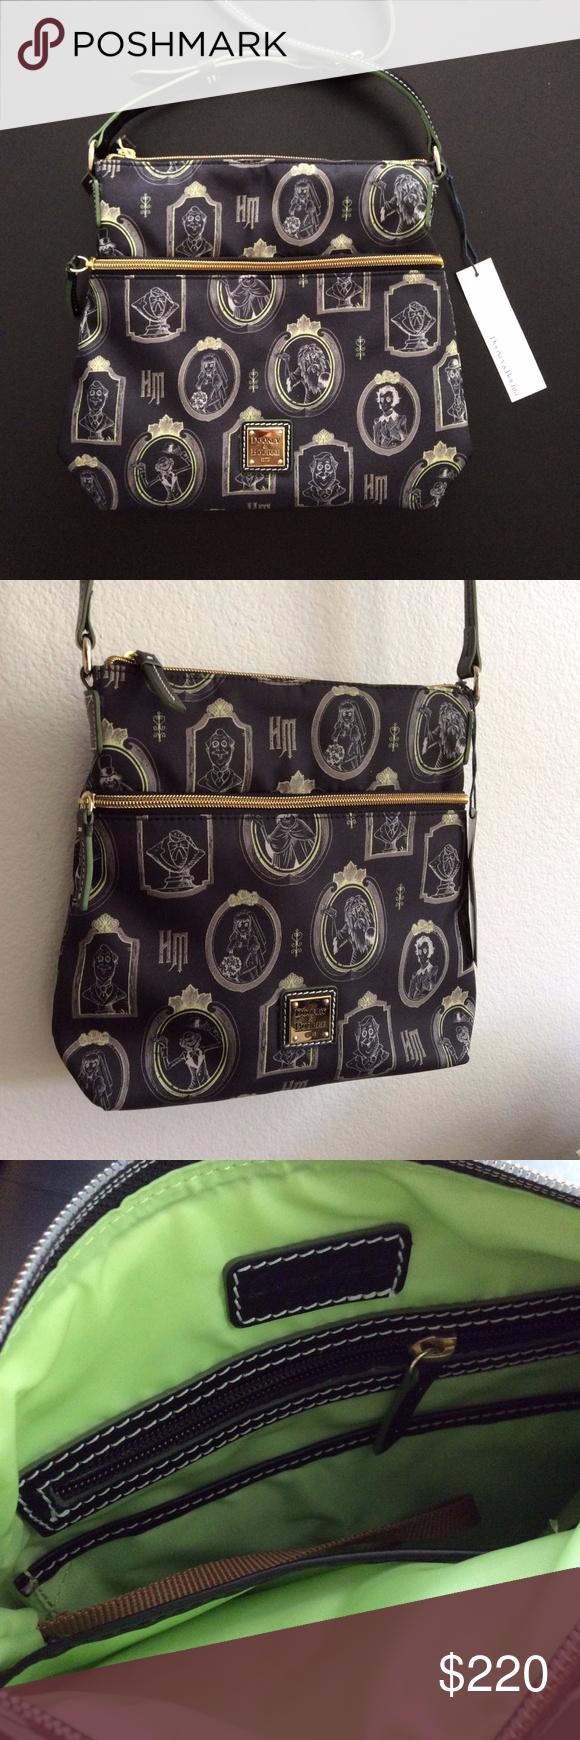 New Dooney Bourke Haunted Mansion Crossbody Bag Bags Dooney Crossbody Bag